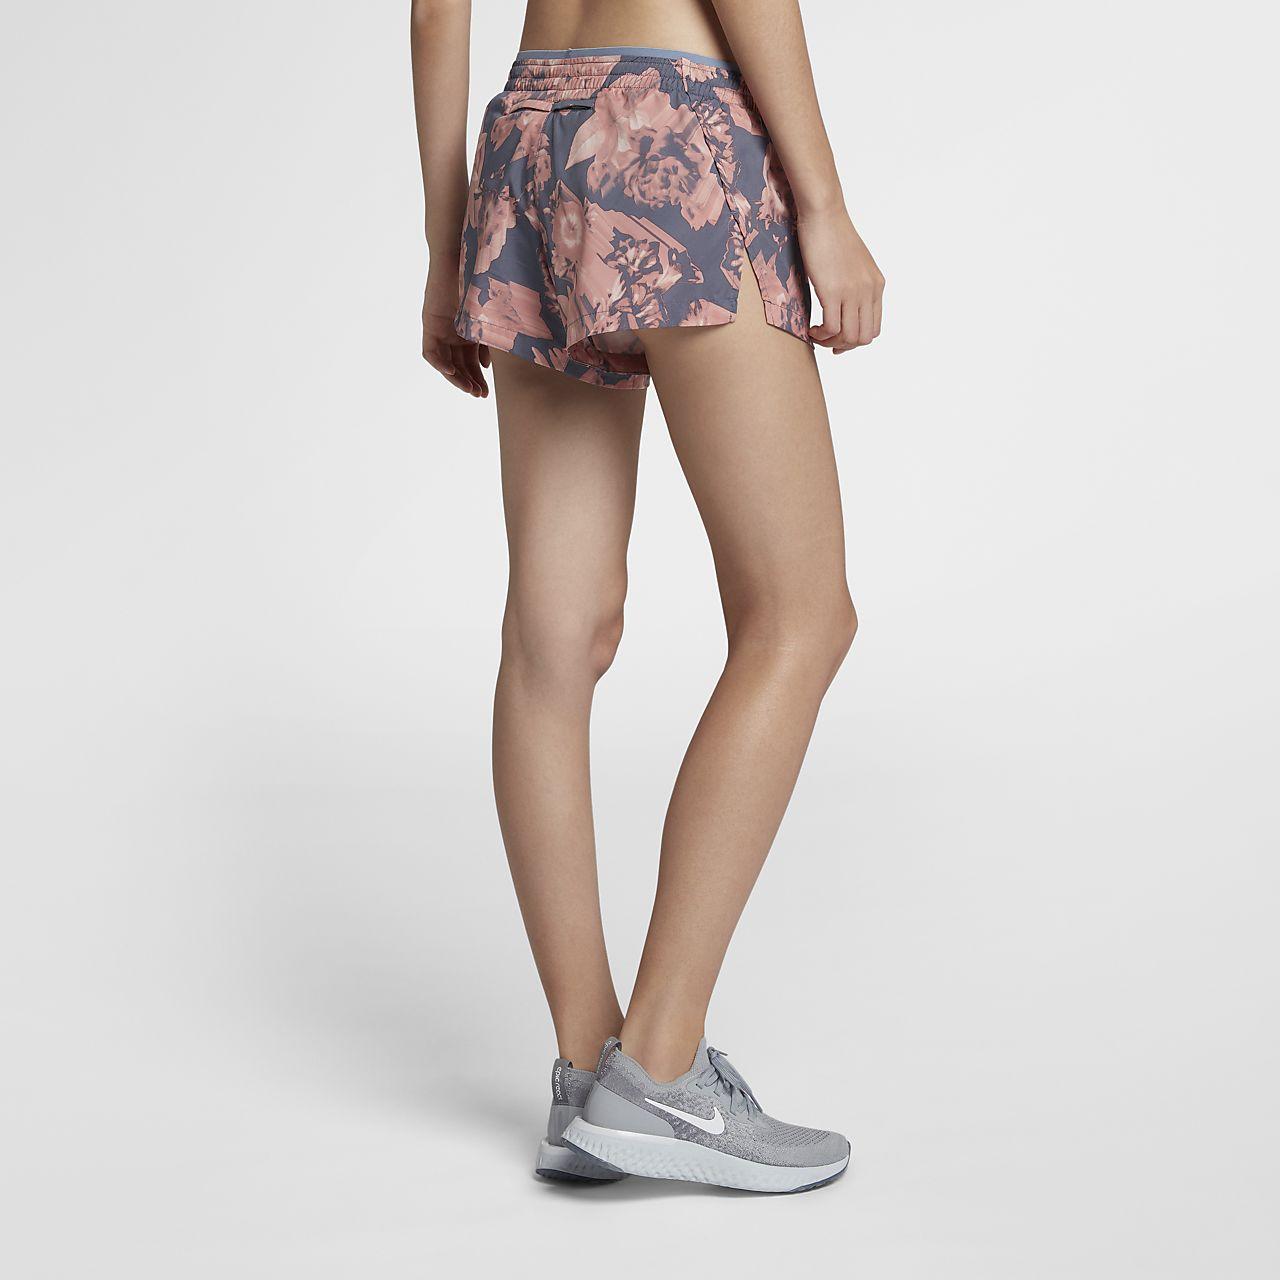 dc803e2002018 Low Resolution Nike Elevate Women s Running Shorts Nike Elevate Women s  Running Shorts